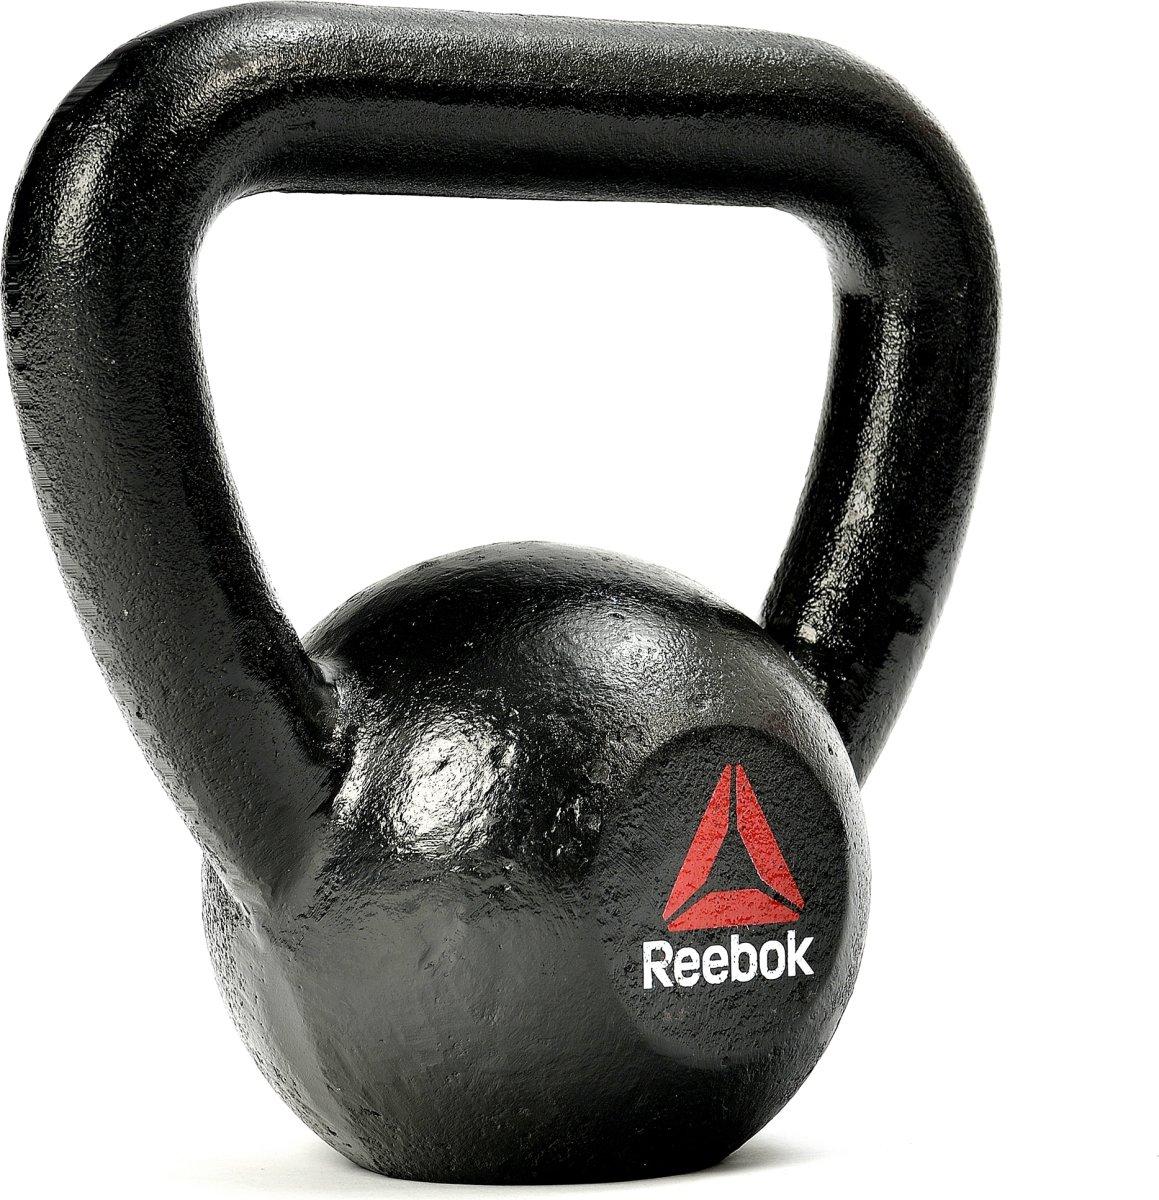 Reebok Functional Kettlebell 24 kg